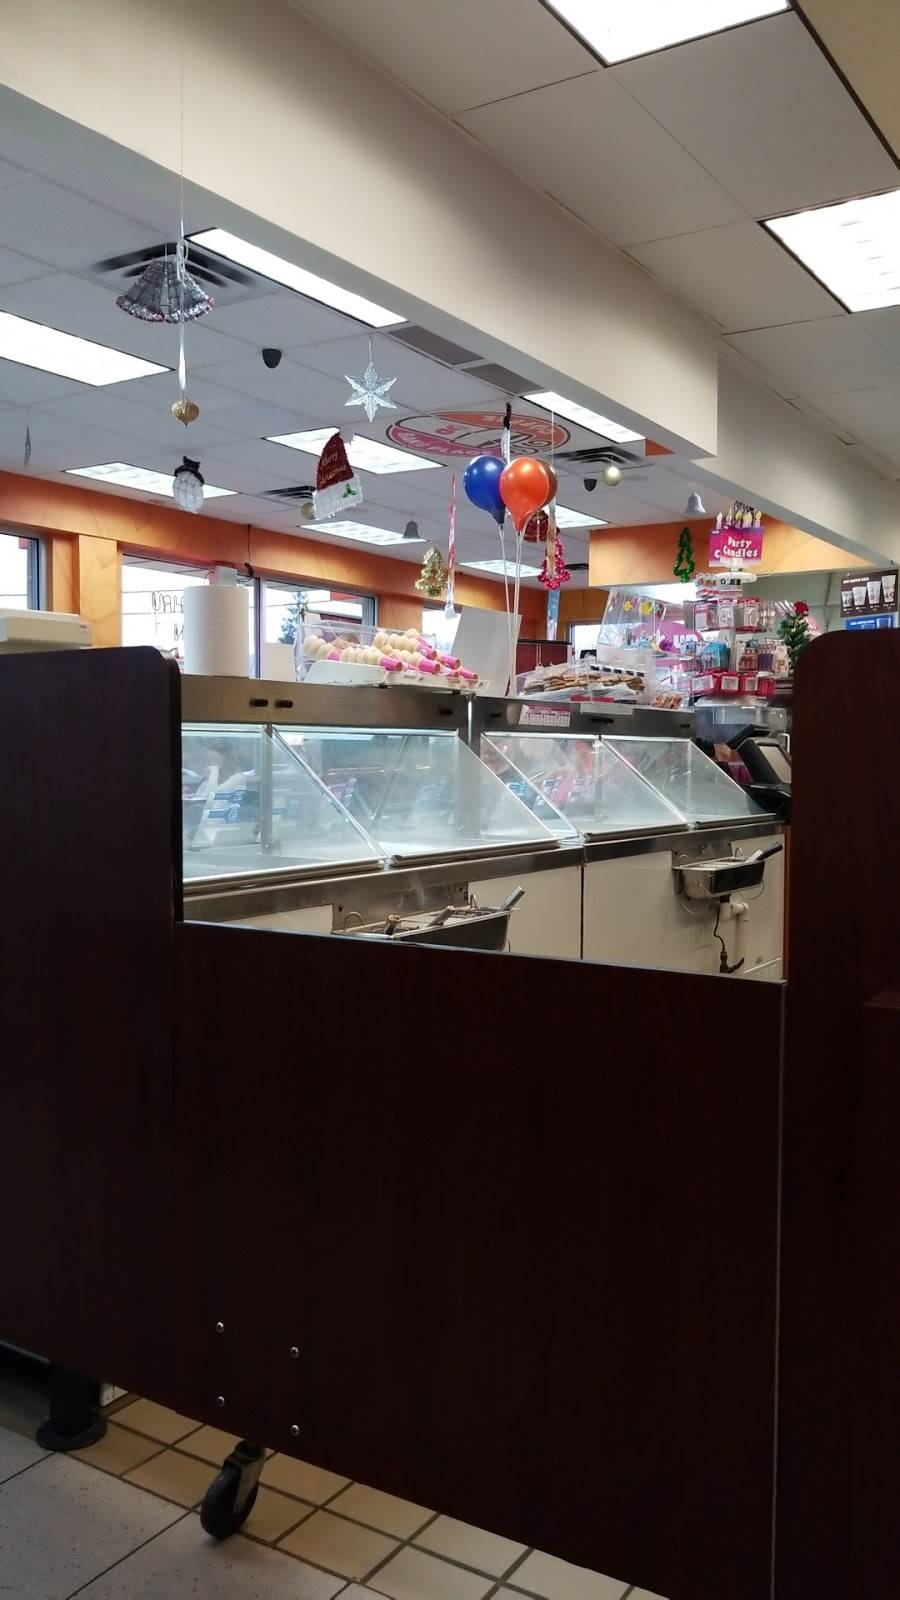 Dunkin Donuts | cafe | 171 Lefante Way, Bayonne, NJ 07002, USA | 2014378080 OR +1 201-437-8080